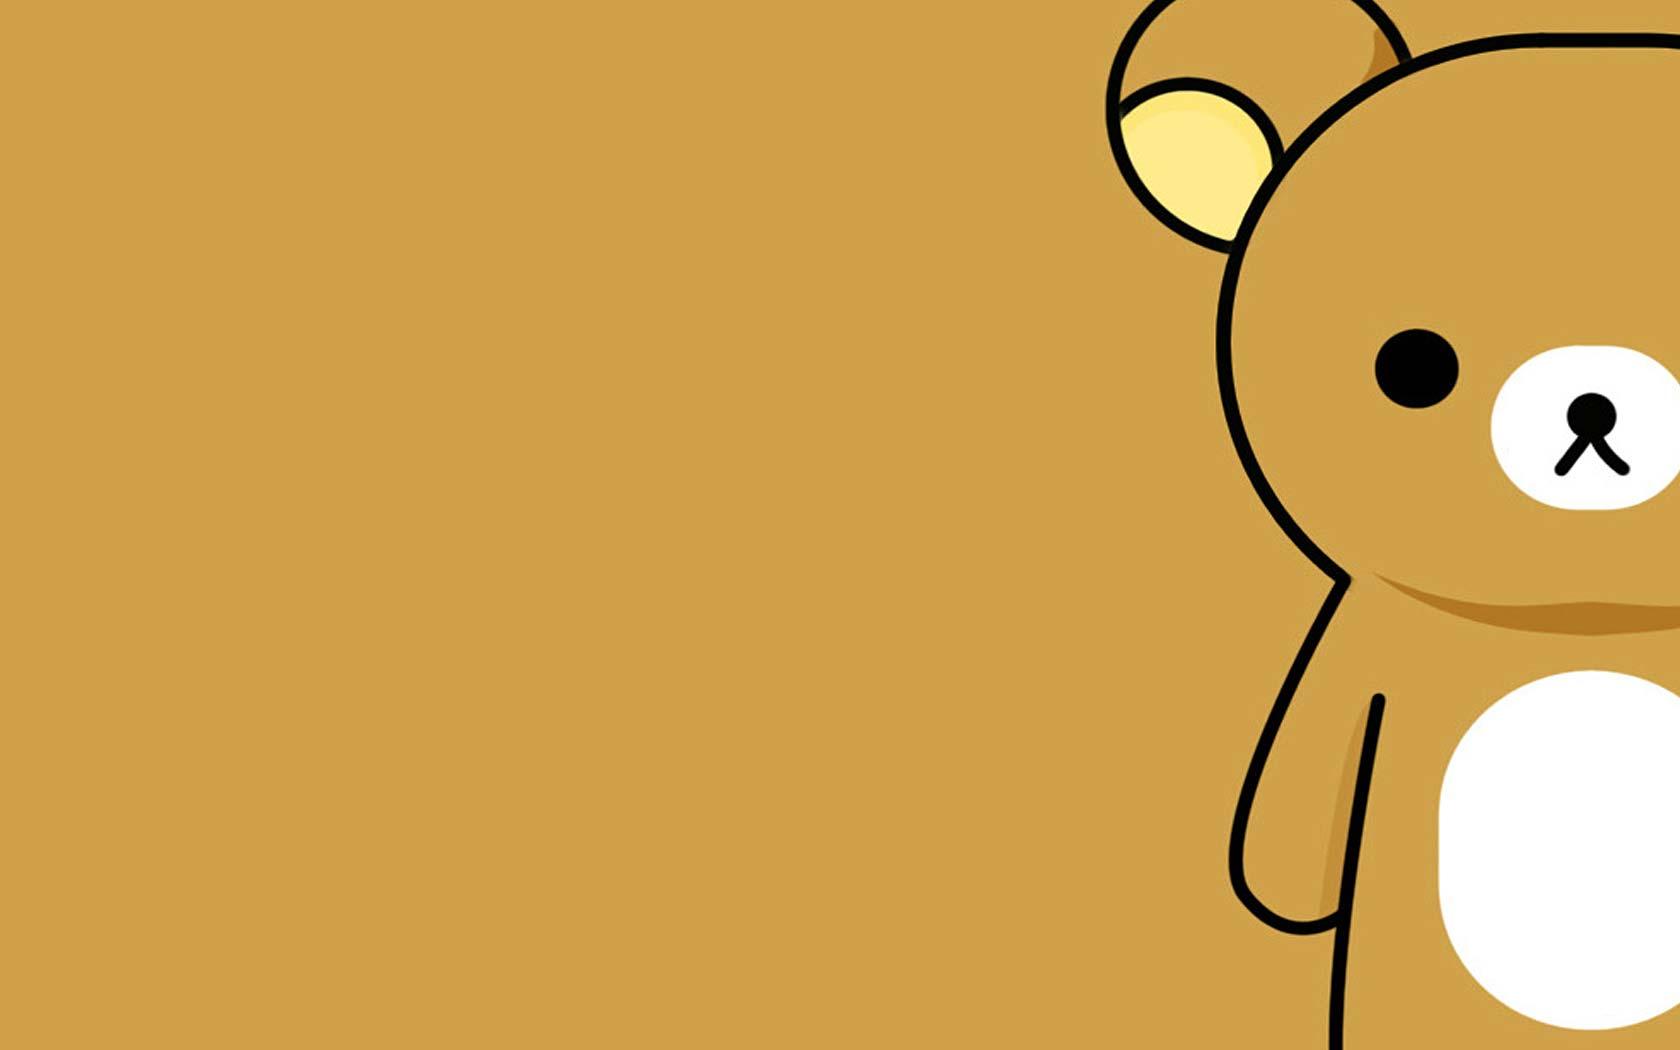 cartoon bear powerpoint - photo #5